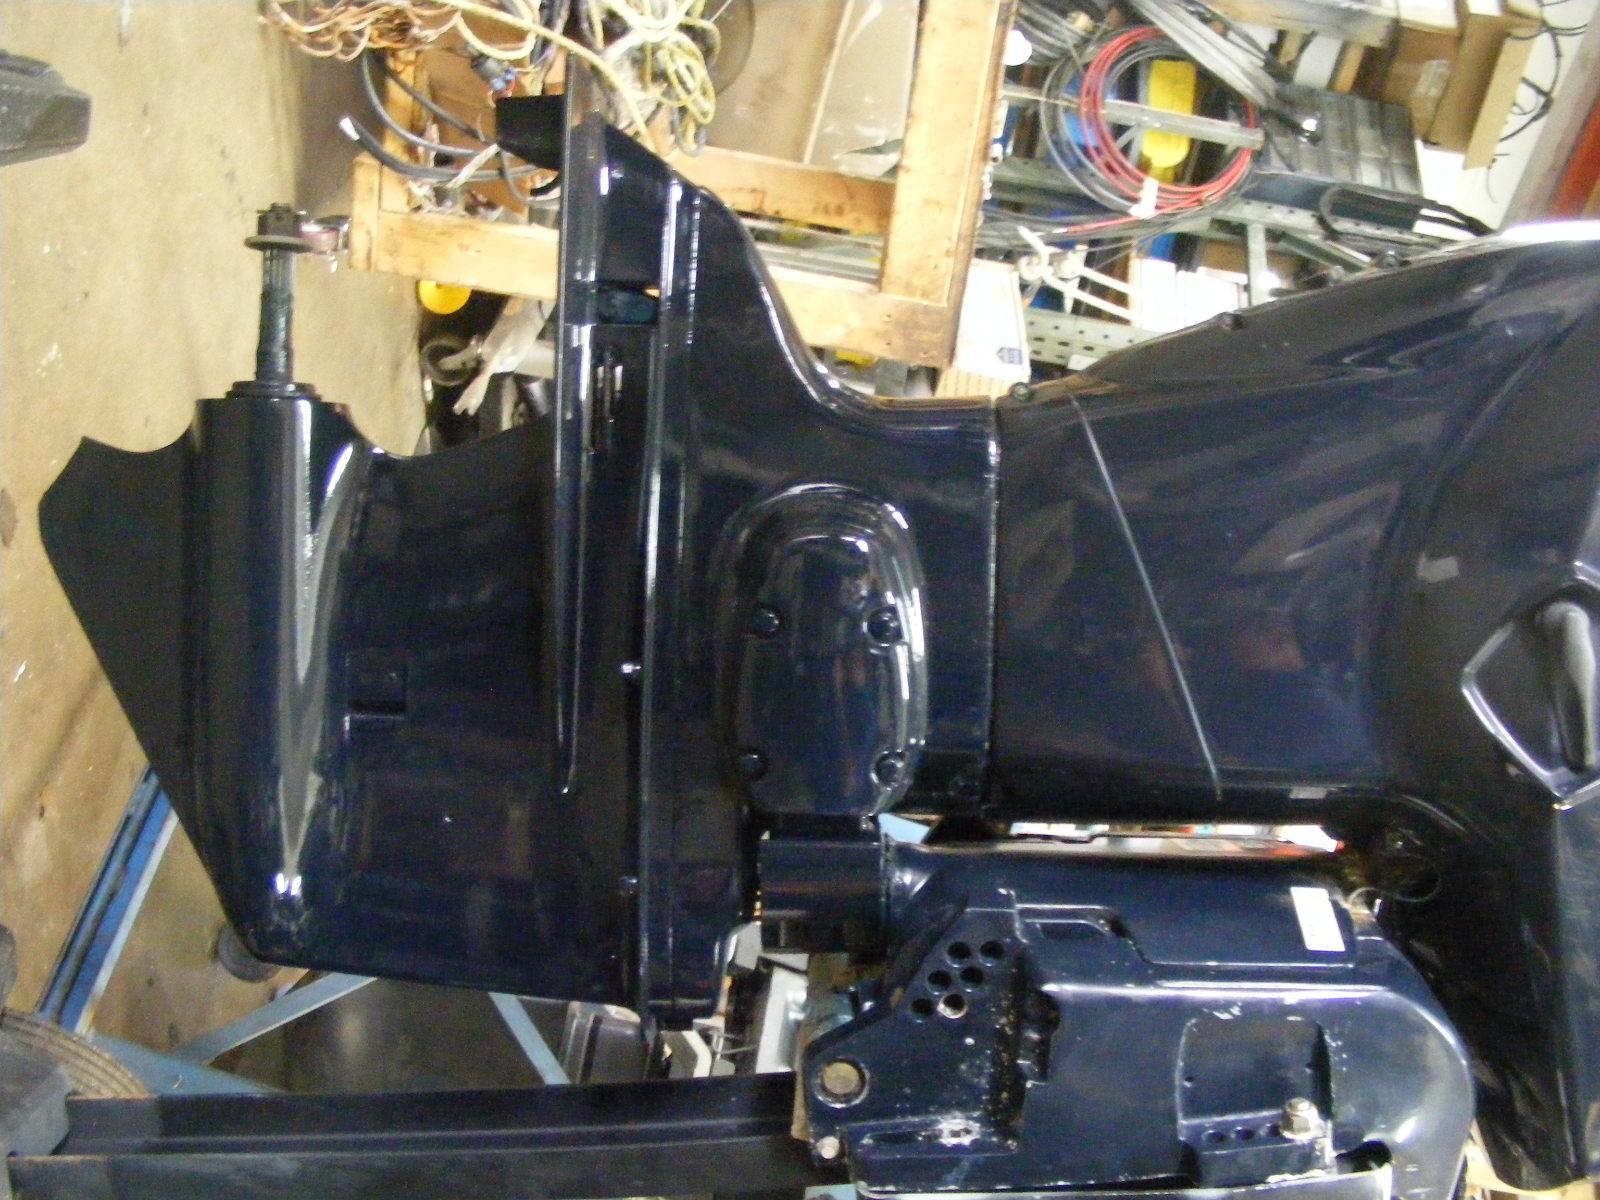 Evinrude Outboard 350 Hp: Rebuilt 1980 81 Johnson Evinrude